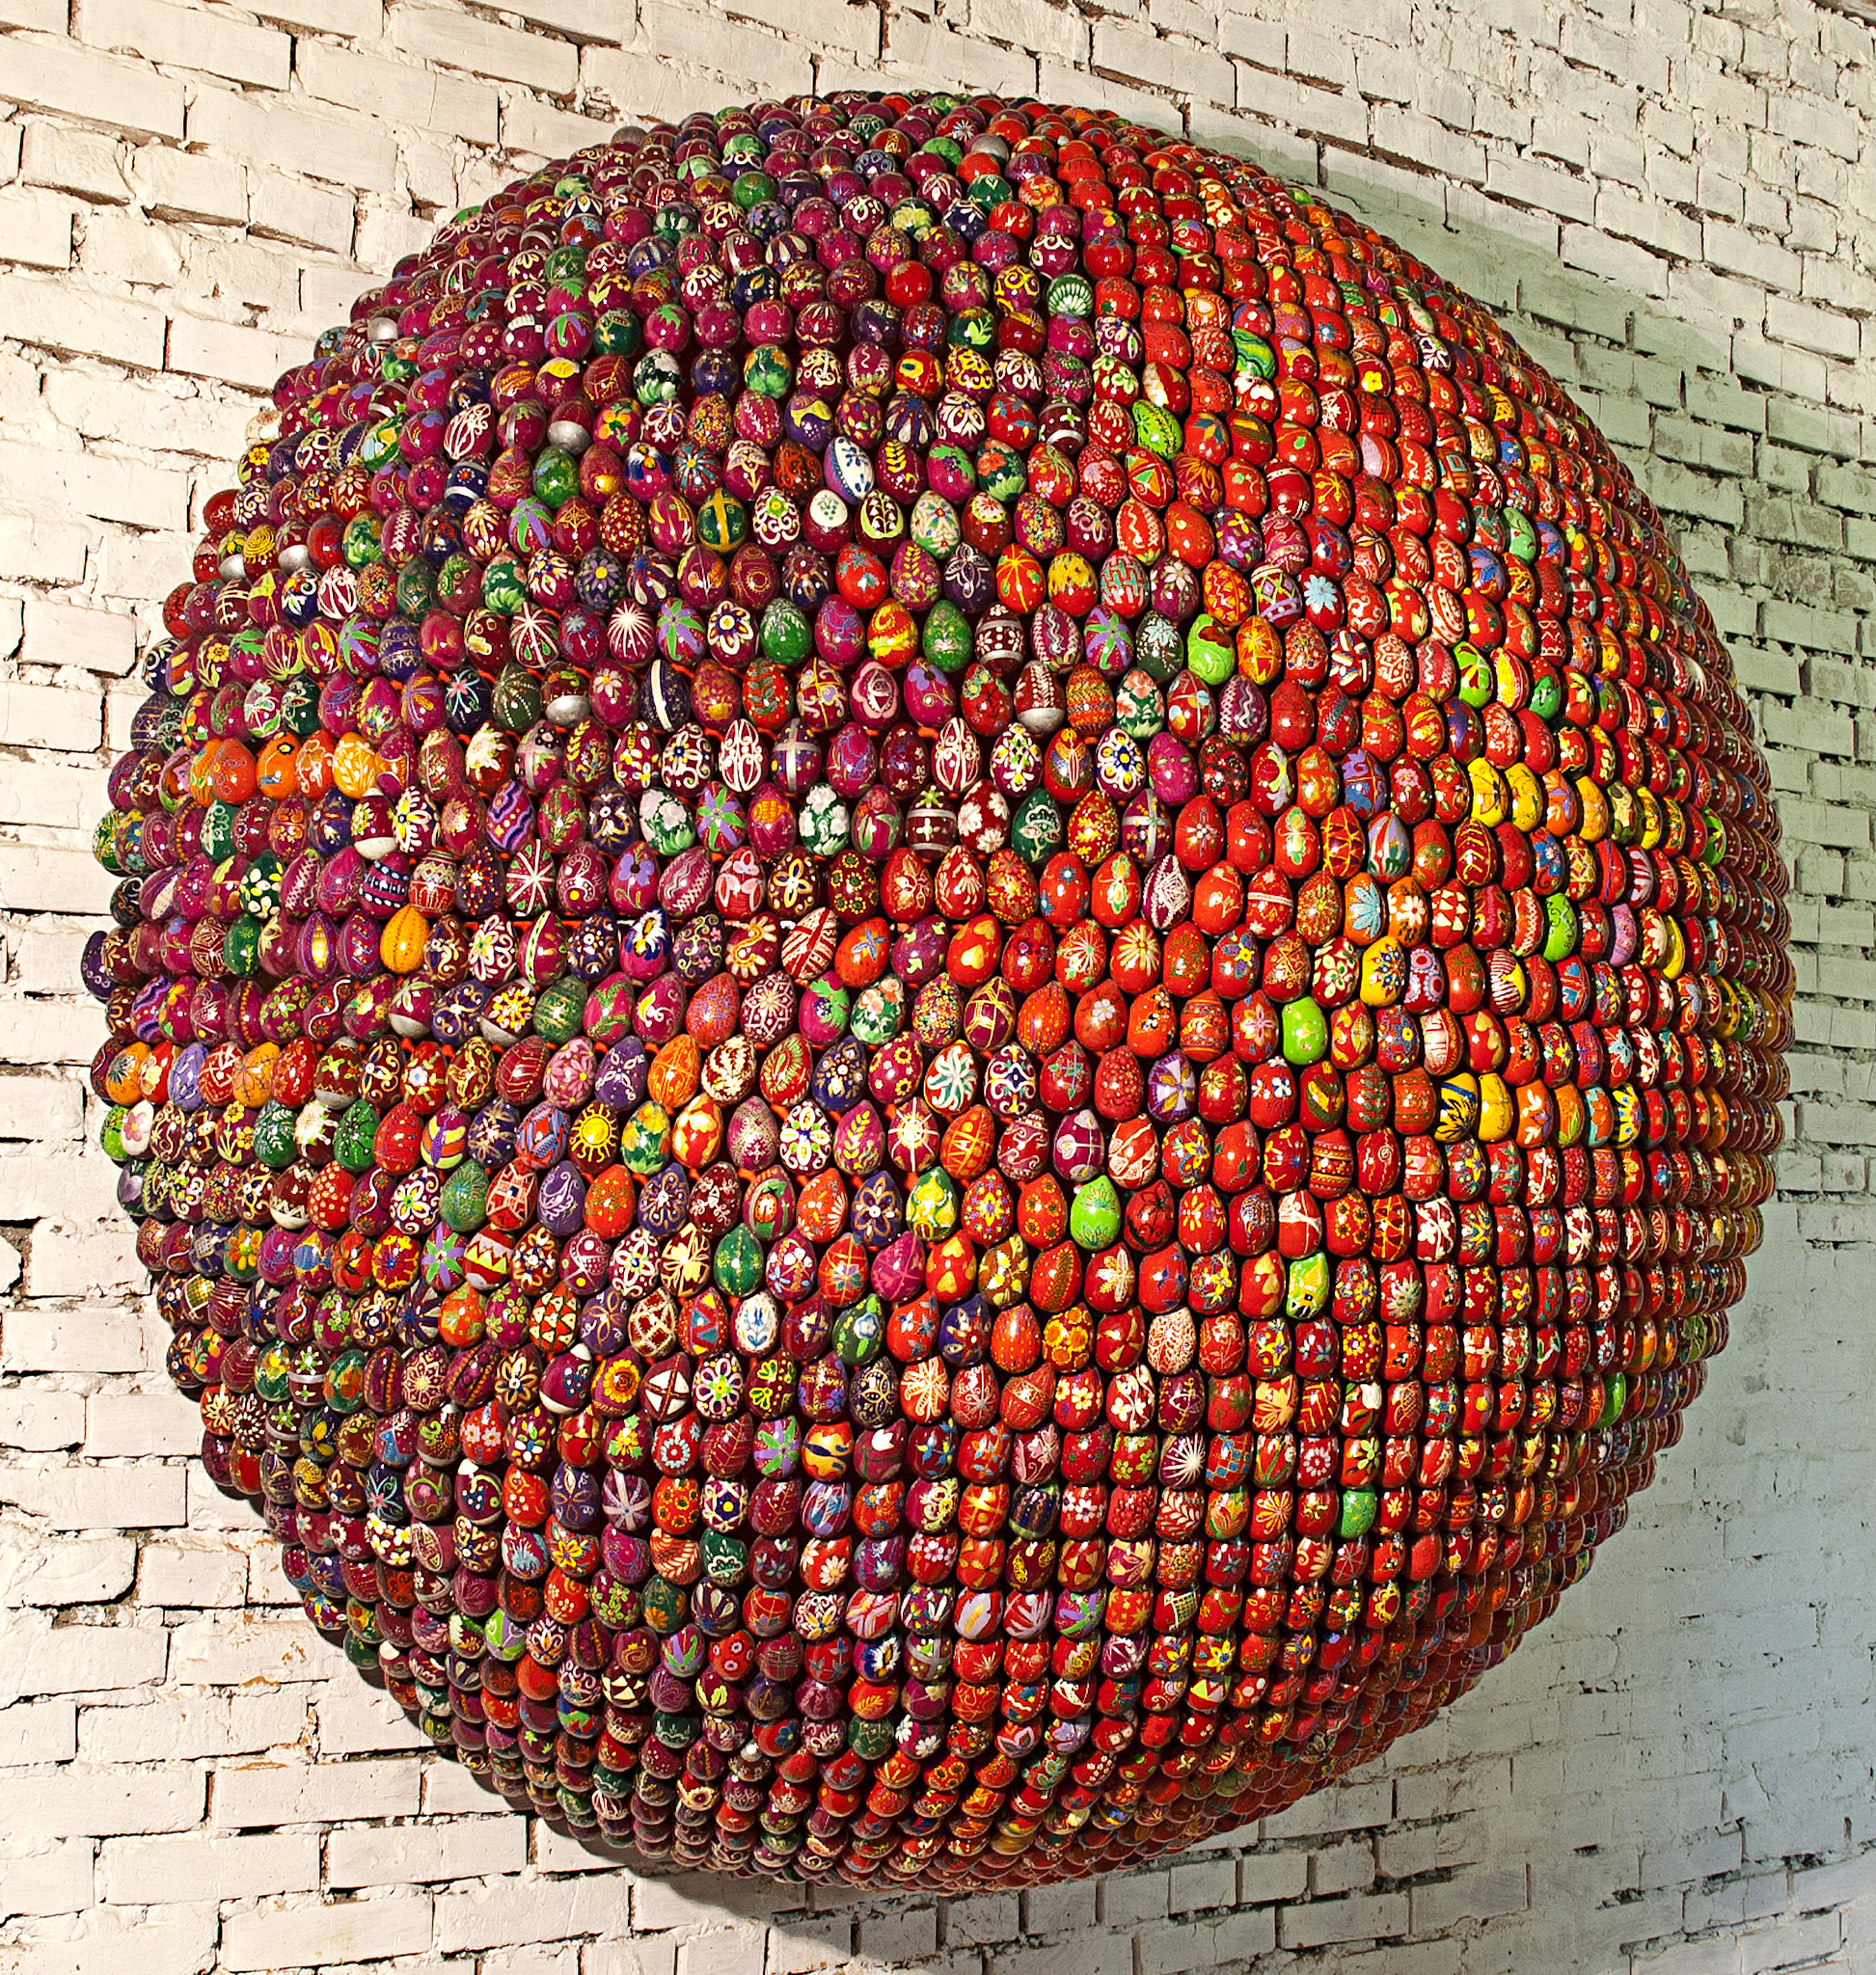 Big semisphere, red, wall- / floor-mounted